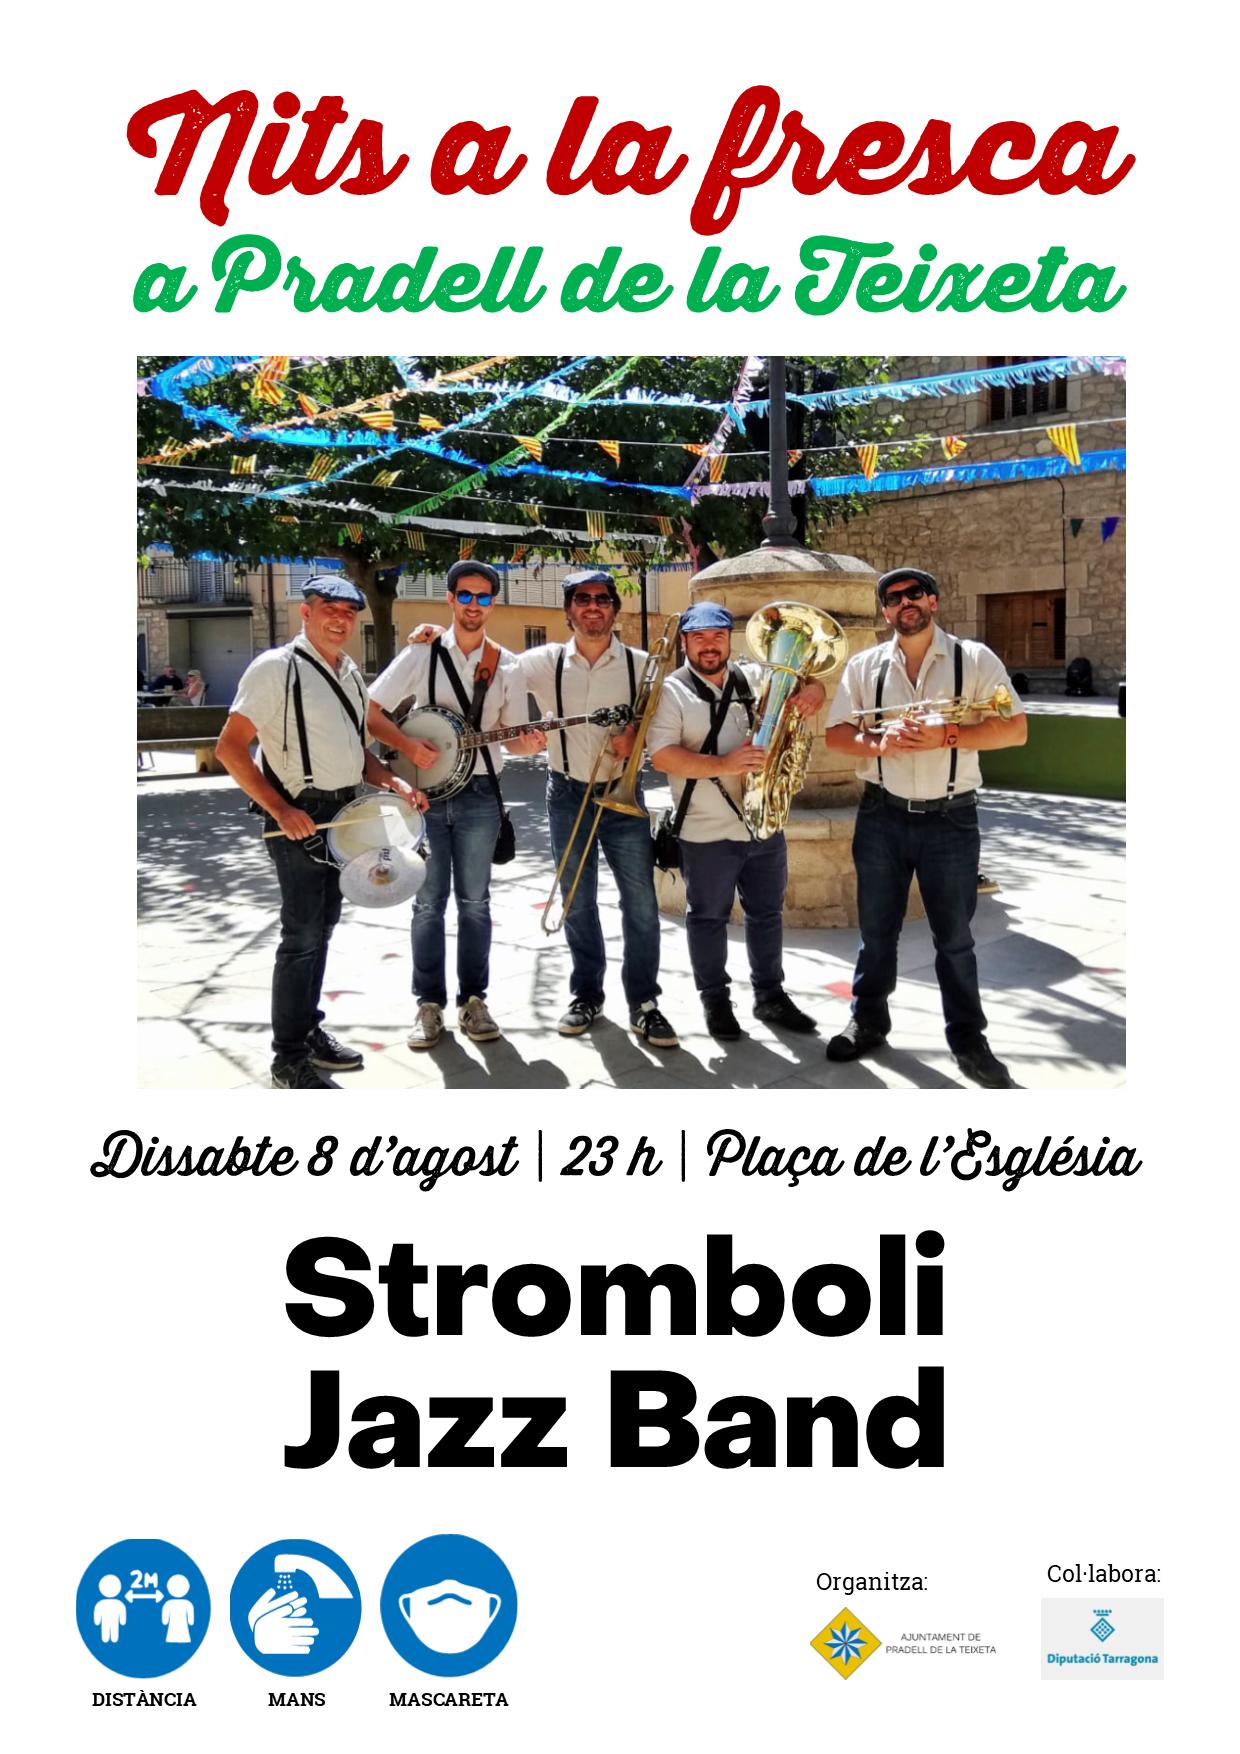 Stromboli 8 agost 2